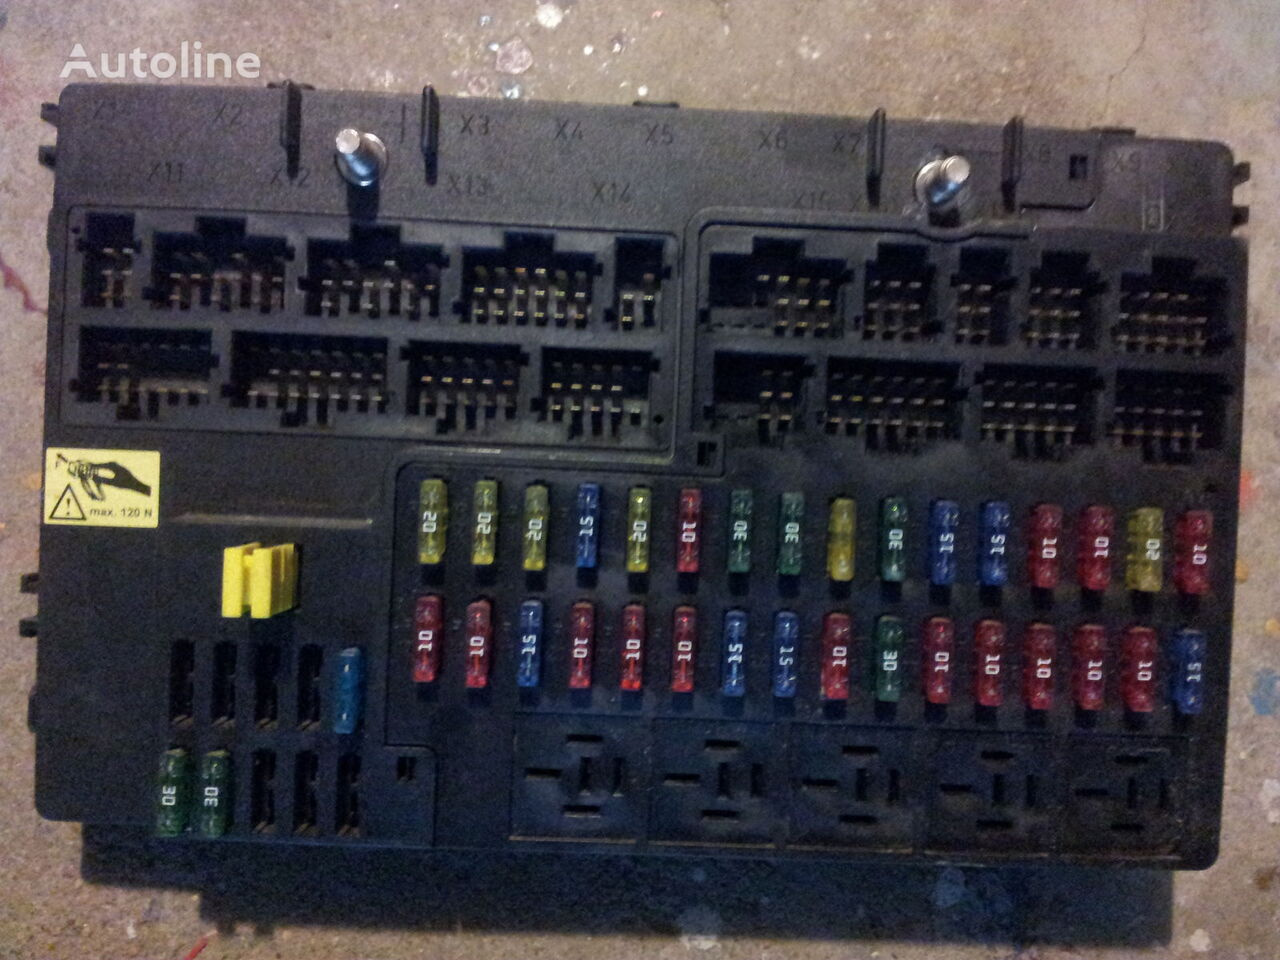 mercedes benz actros mp2 mp3 gm unit grundmodul fuse box central rh autoline eu co uk mercedes benz actros fuse box location 2000 Mercedes S500 Fuse Box Diagram